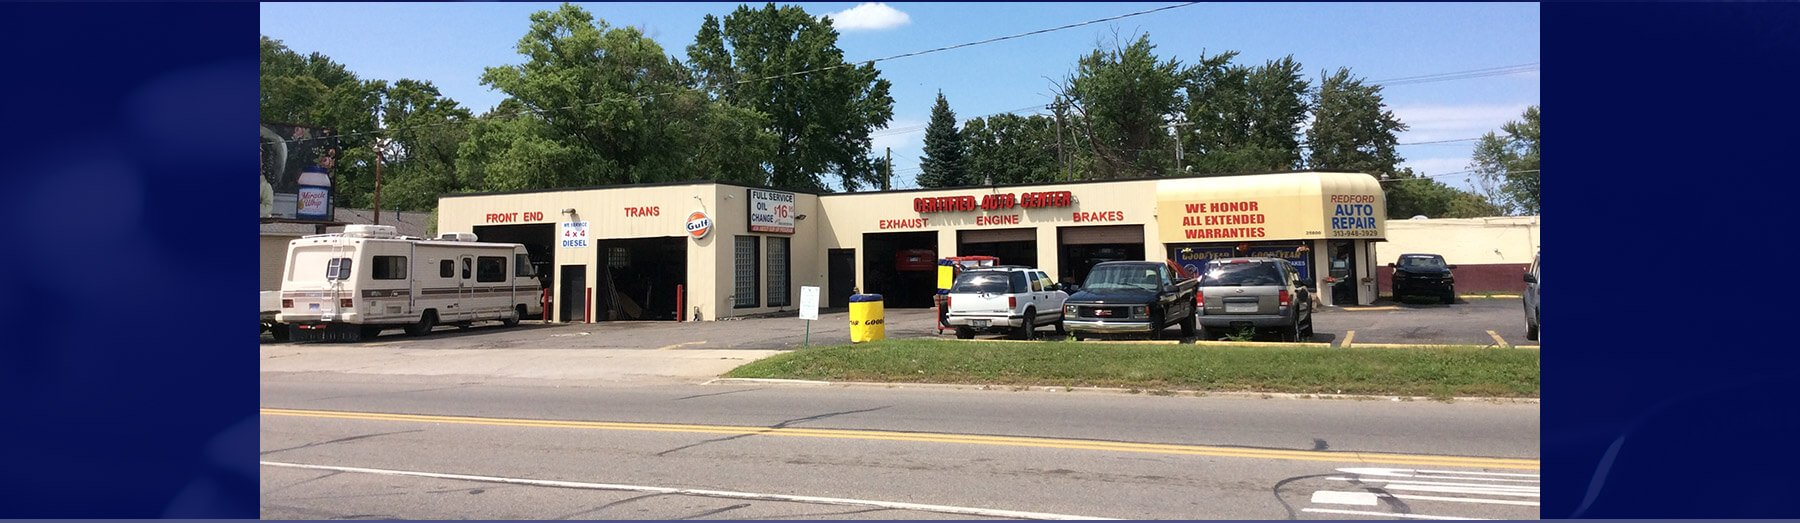 Car Maintenance | Detroit, MI | Redford Auto Repair